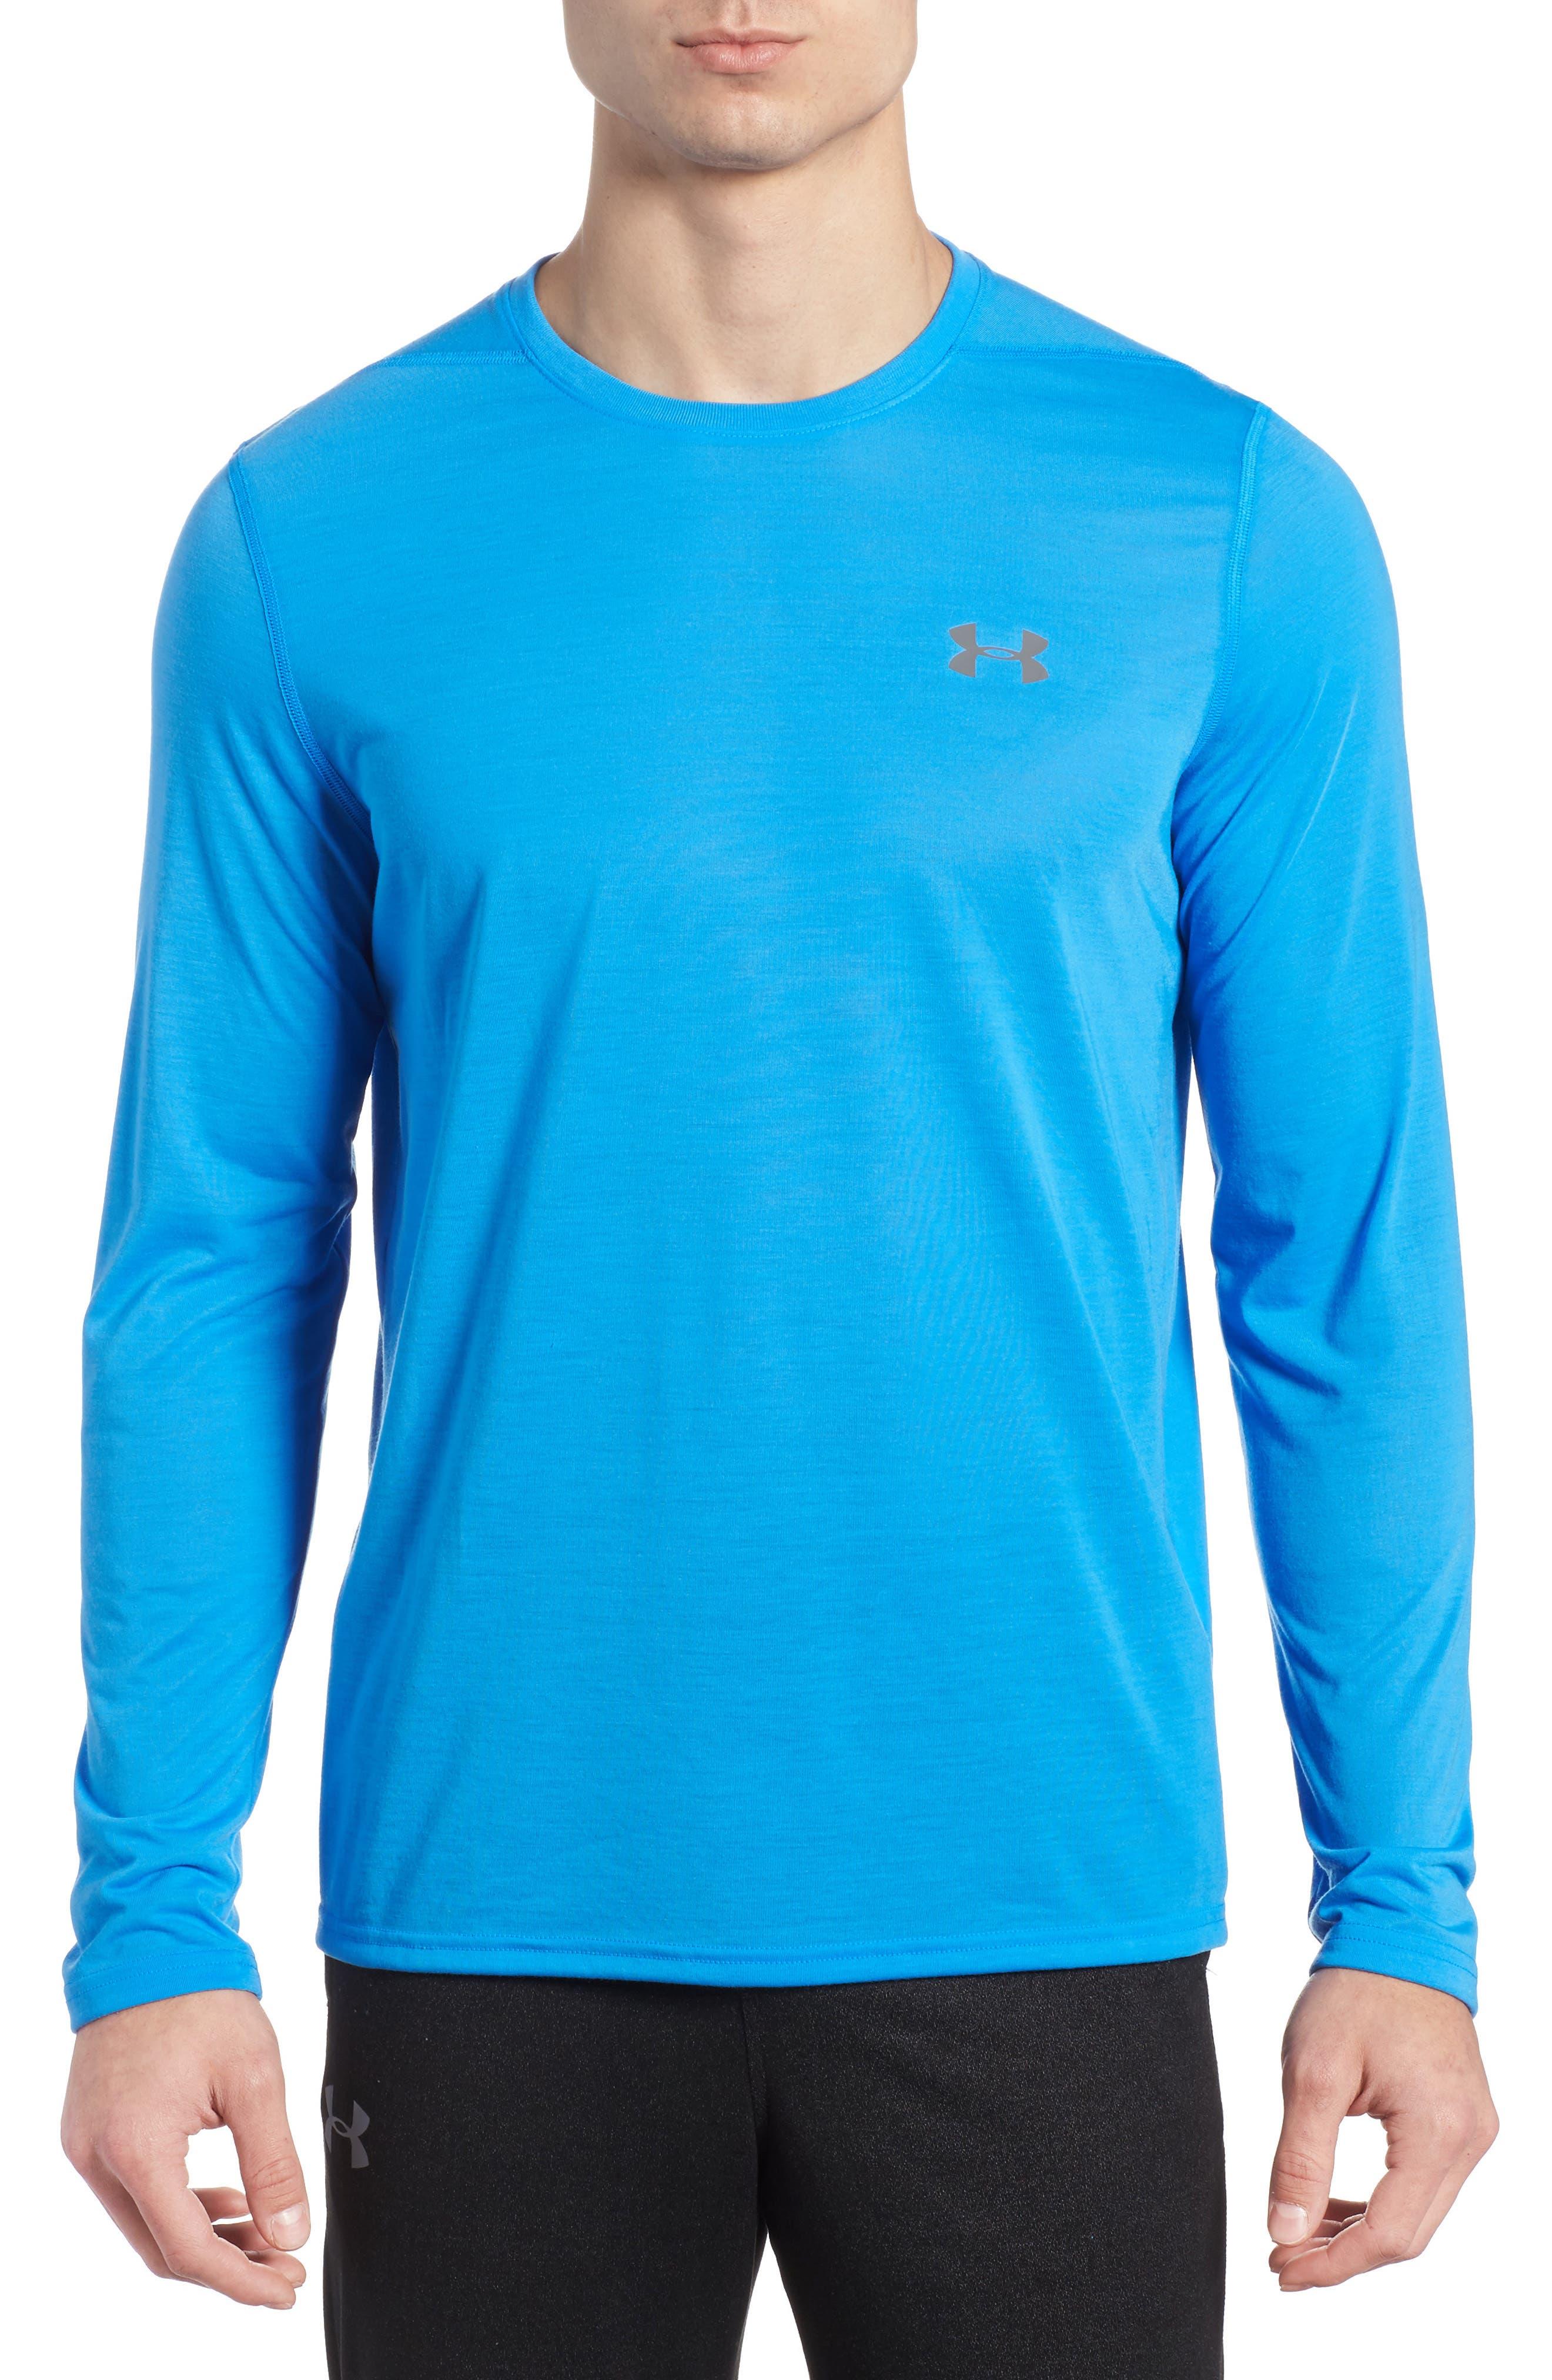 Main Image - Under Armour Threadborne Long Sleeve Training T-Shirt